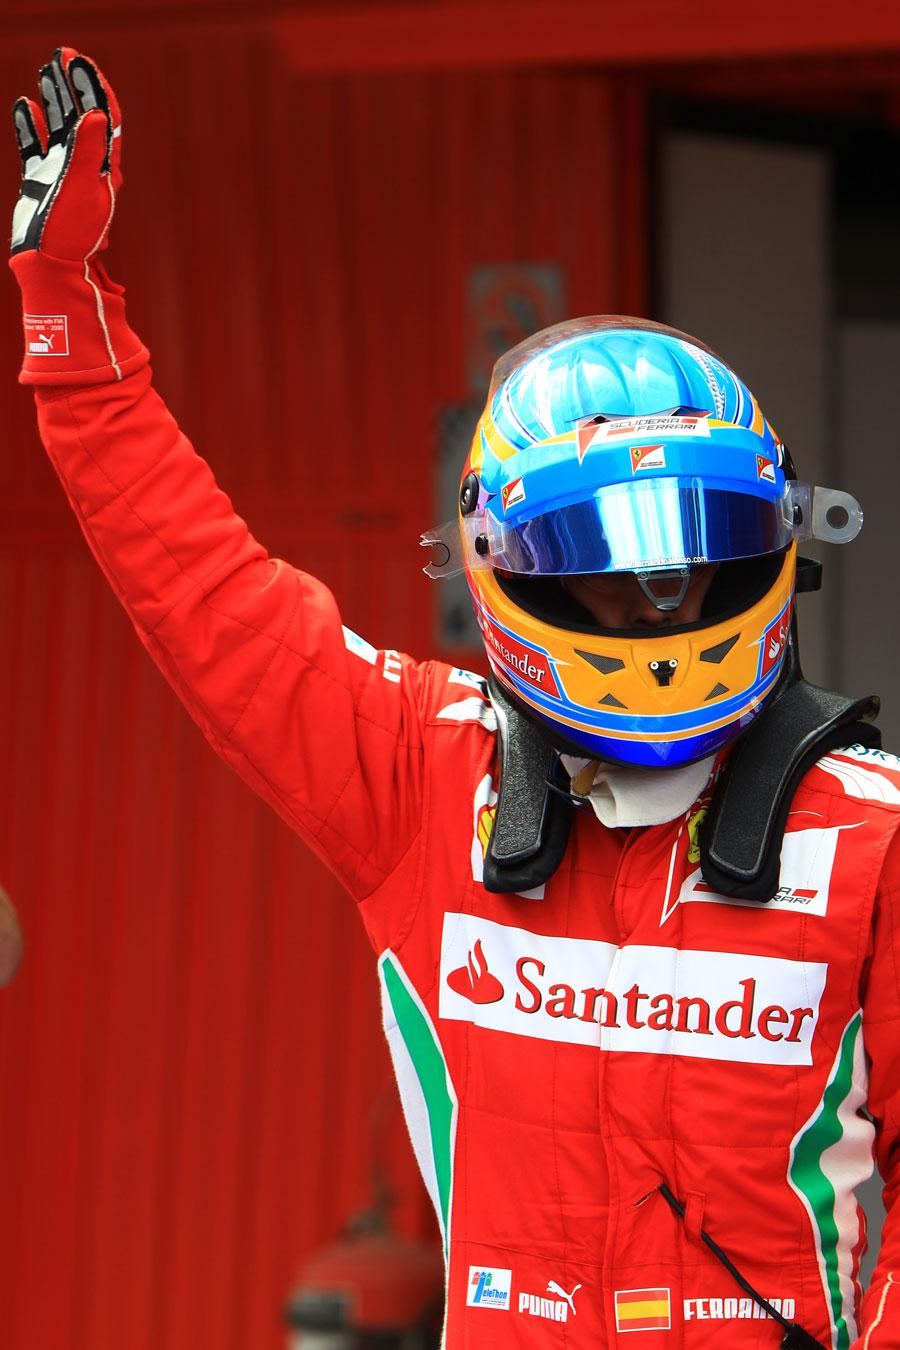 14607 - Ferrari making progress - Alonso